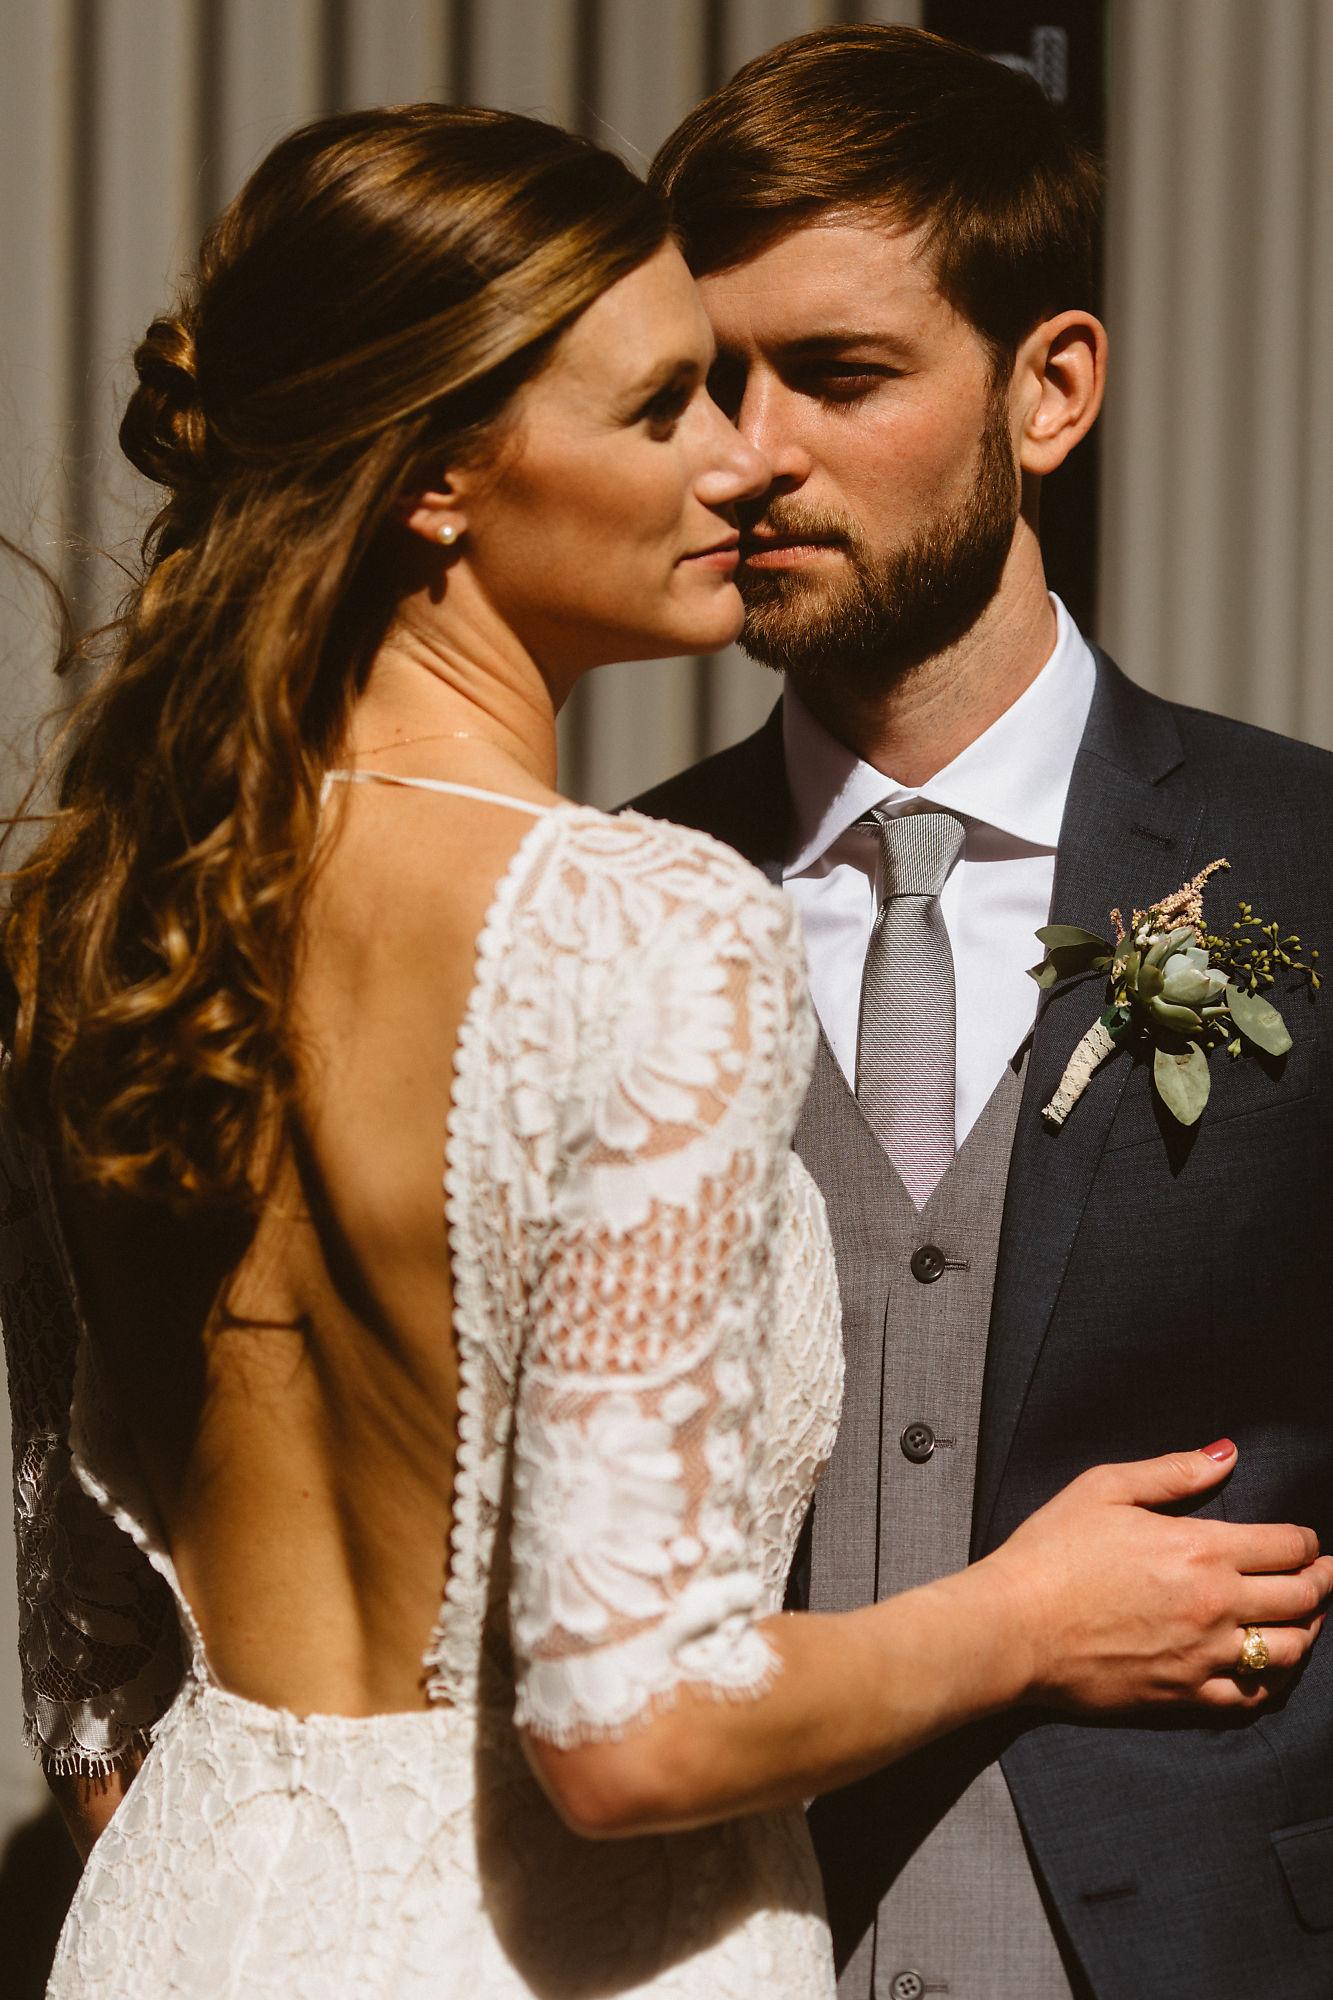 jessica_austin_oasis_brewery_wedding_photos135517.jpg